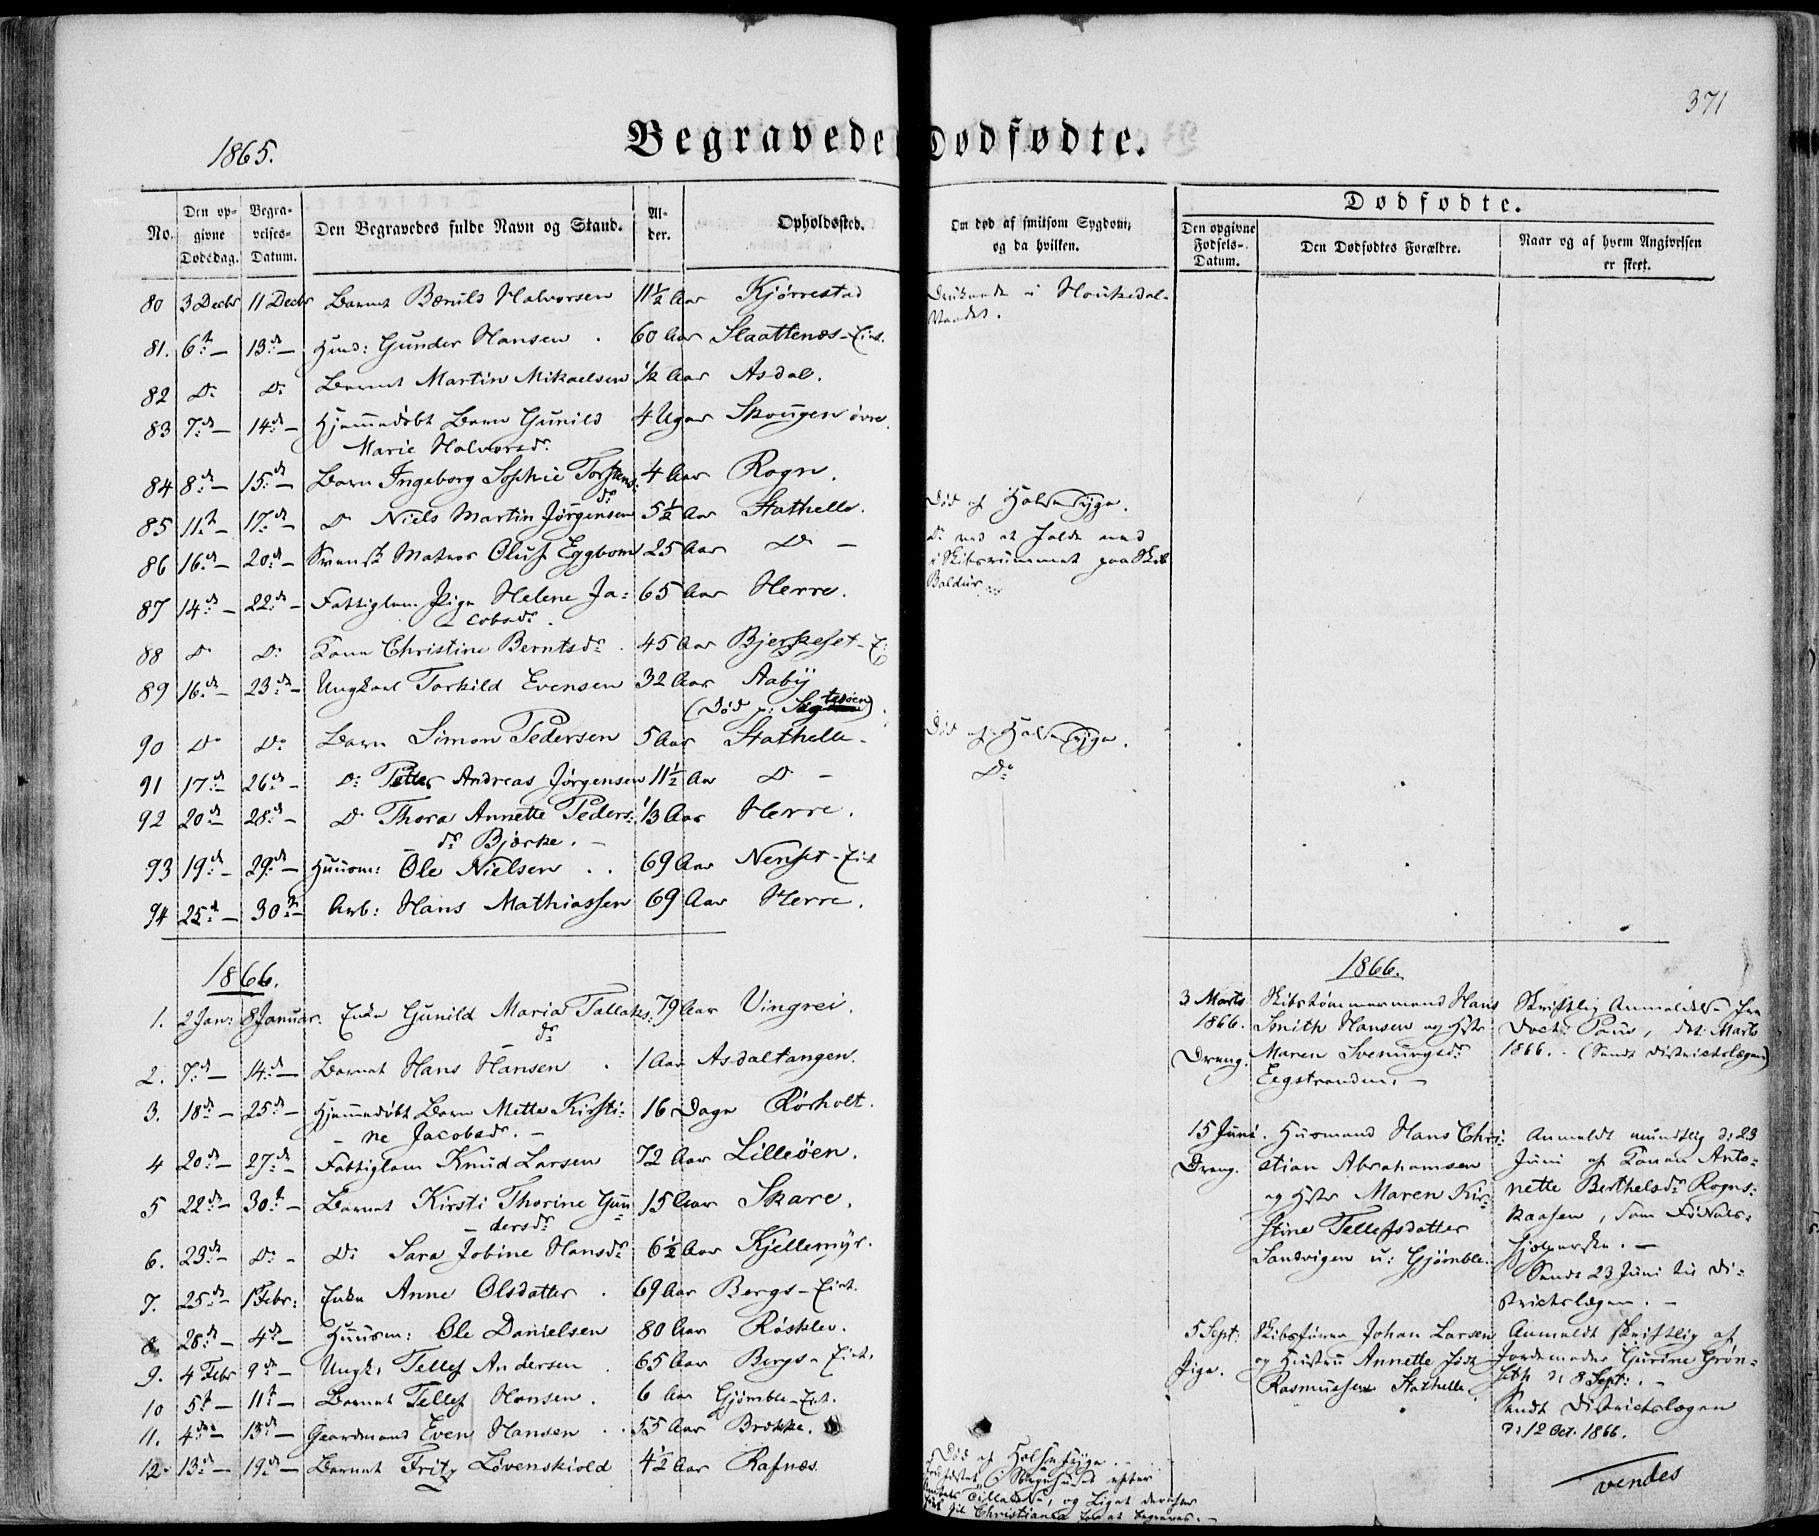 SAKO, Bamble kirkebøker, F/Fa/L0005: Ministerialbok nr. I 5, 1854-1869, s. 371